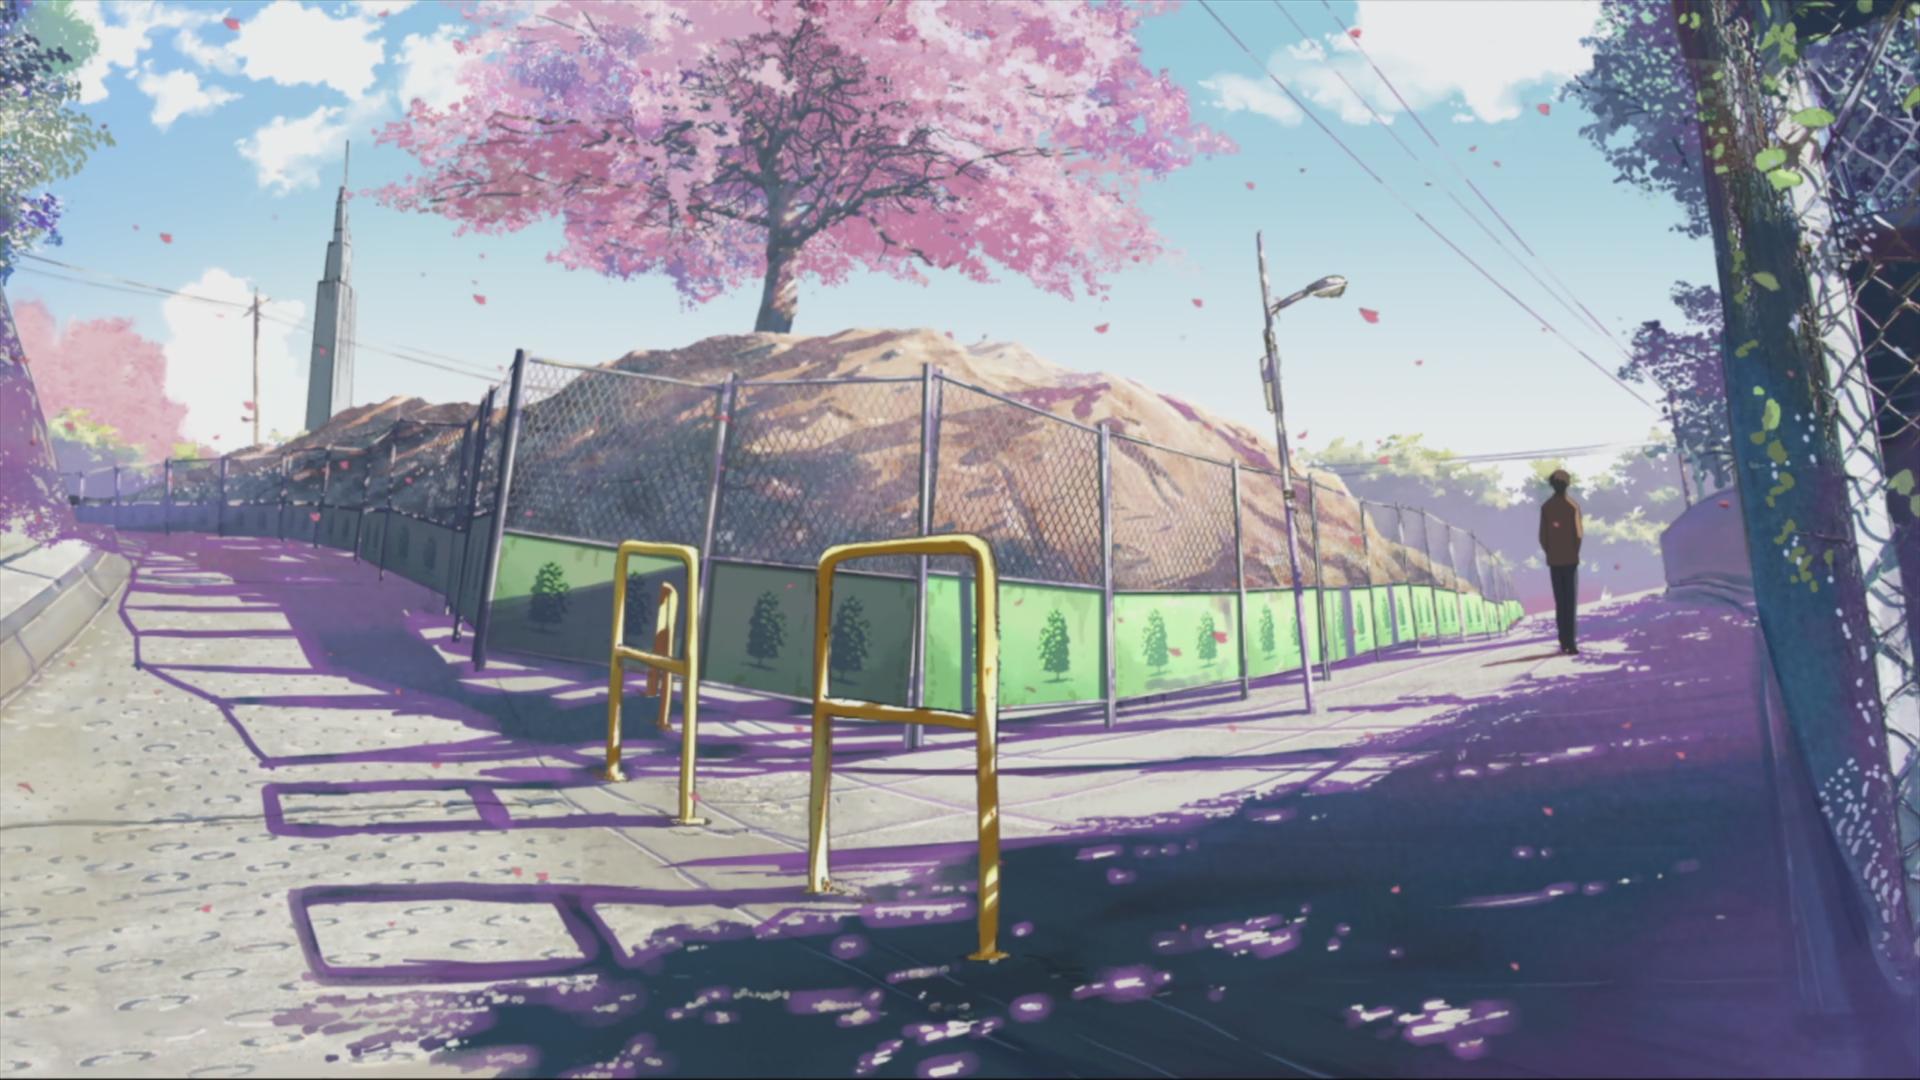 Anime 1920x1080 5 Centimeters Per Second Makoto Shinkai  anime